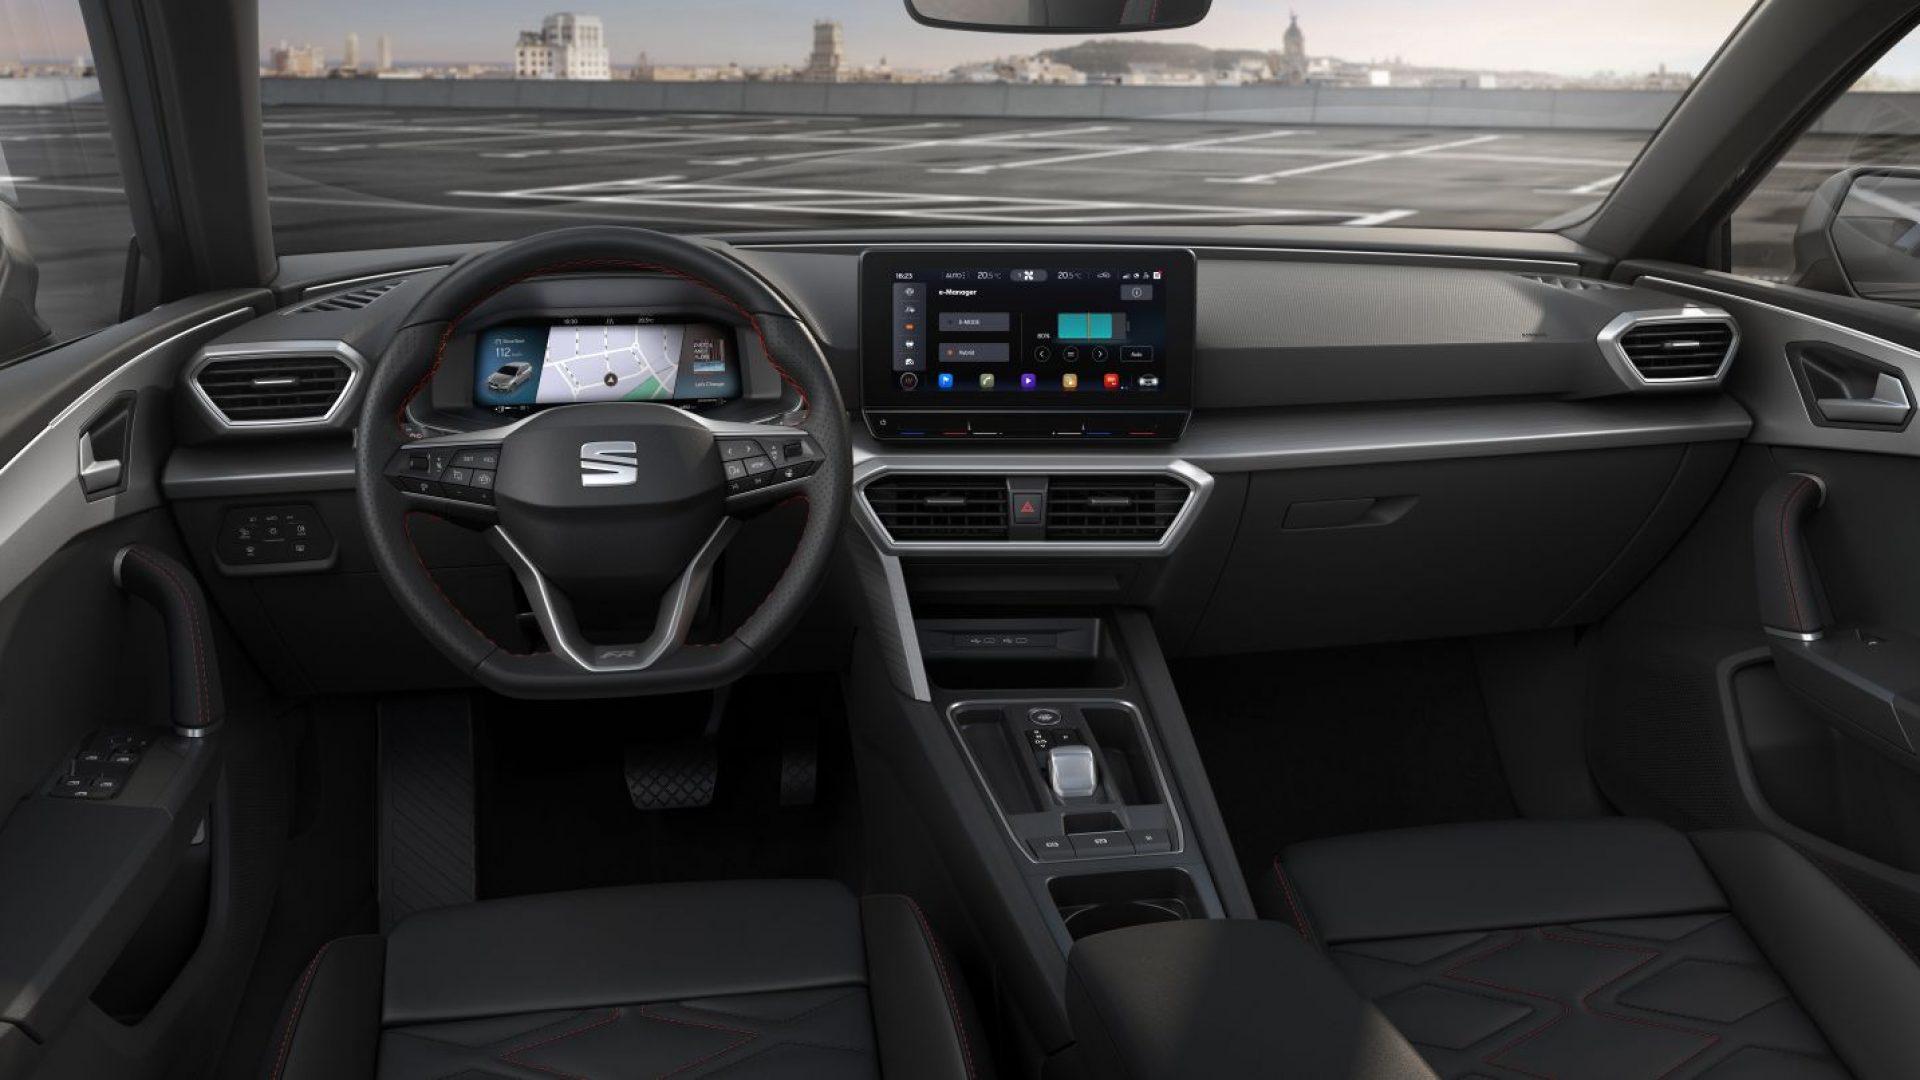 All-new-SEAT-Leon-5-doors_14_HQ